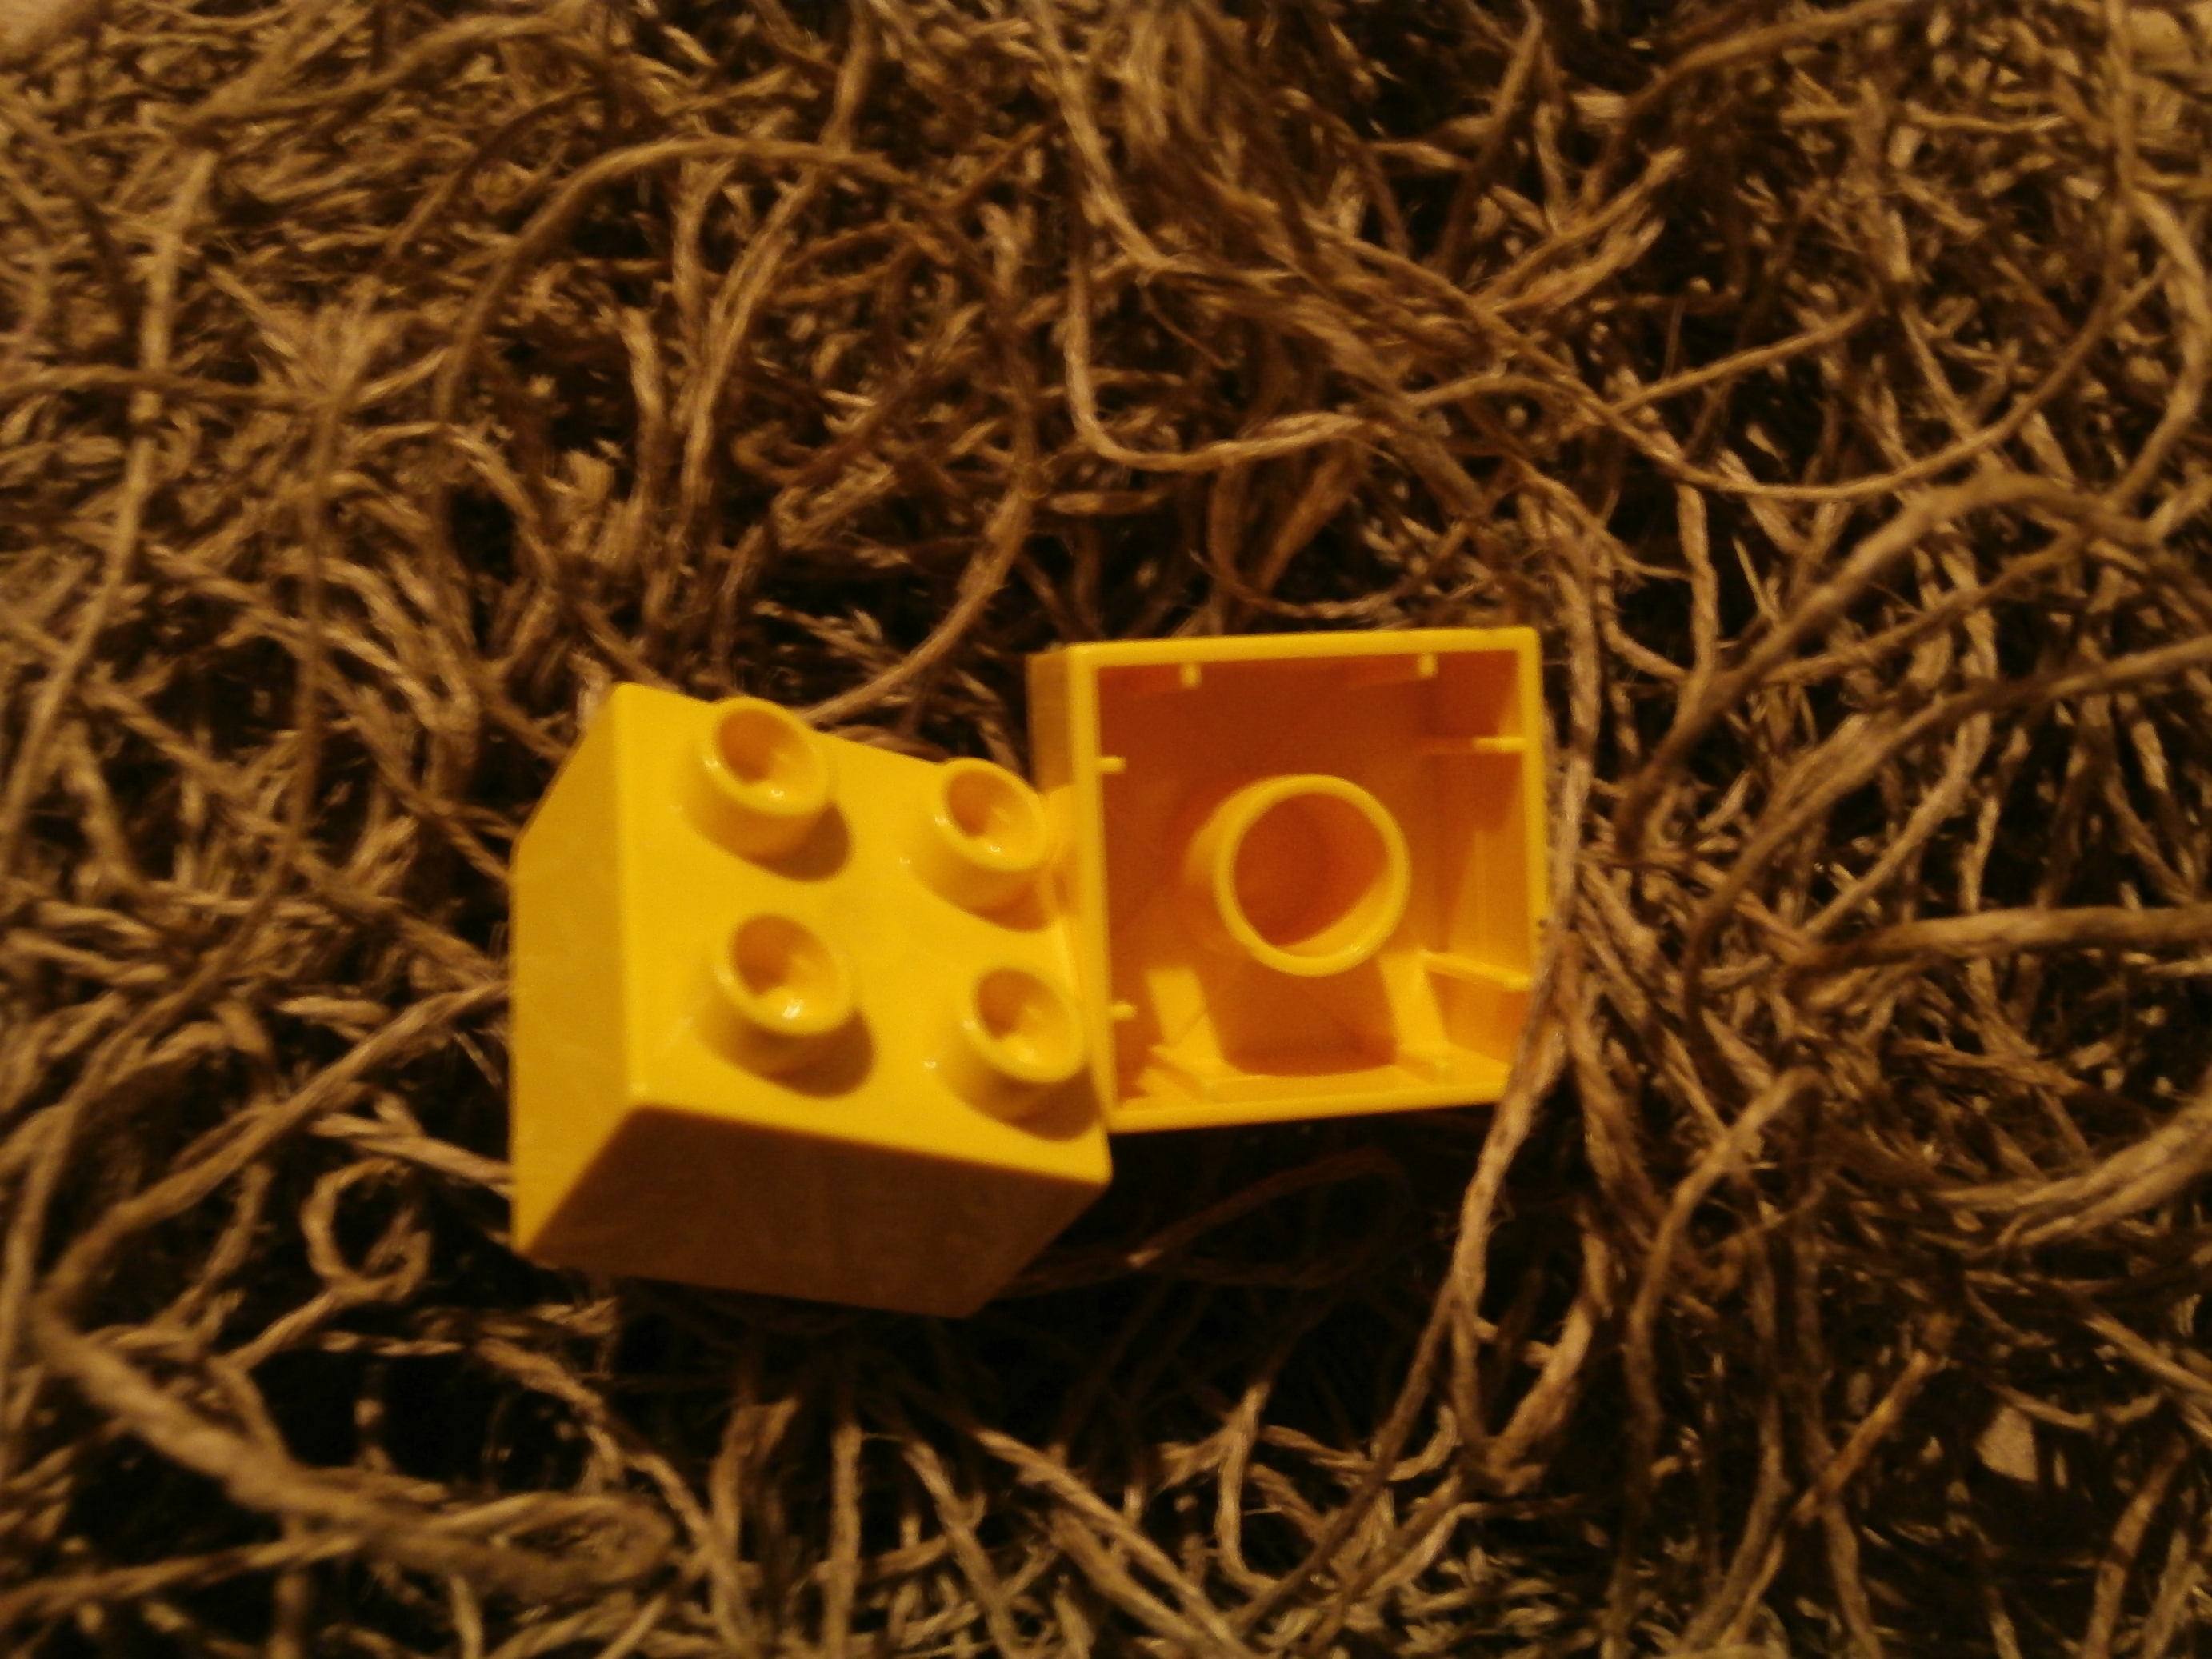 lego kocka1.JPG